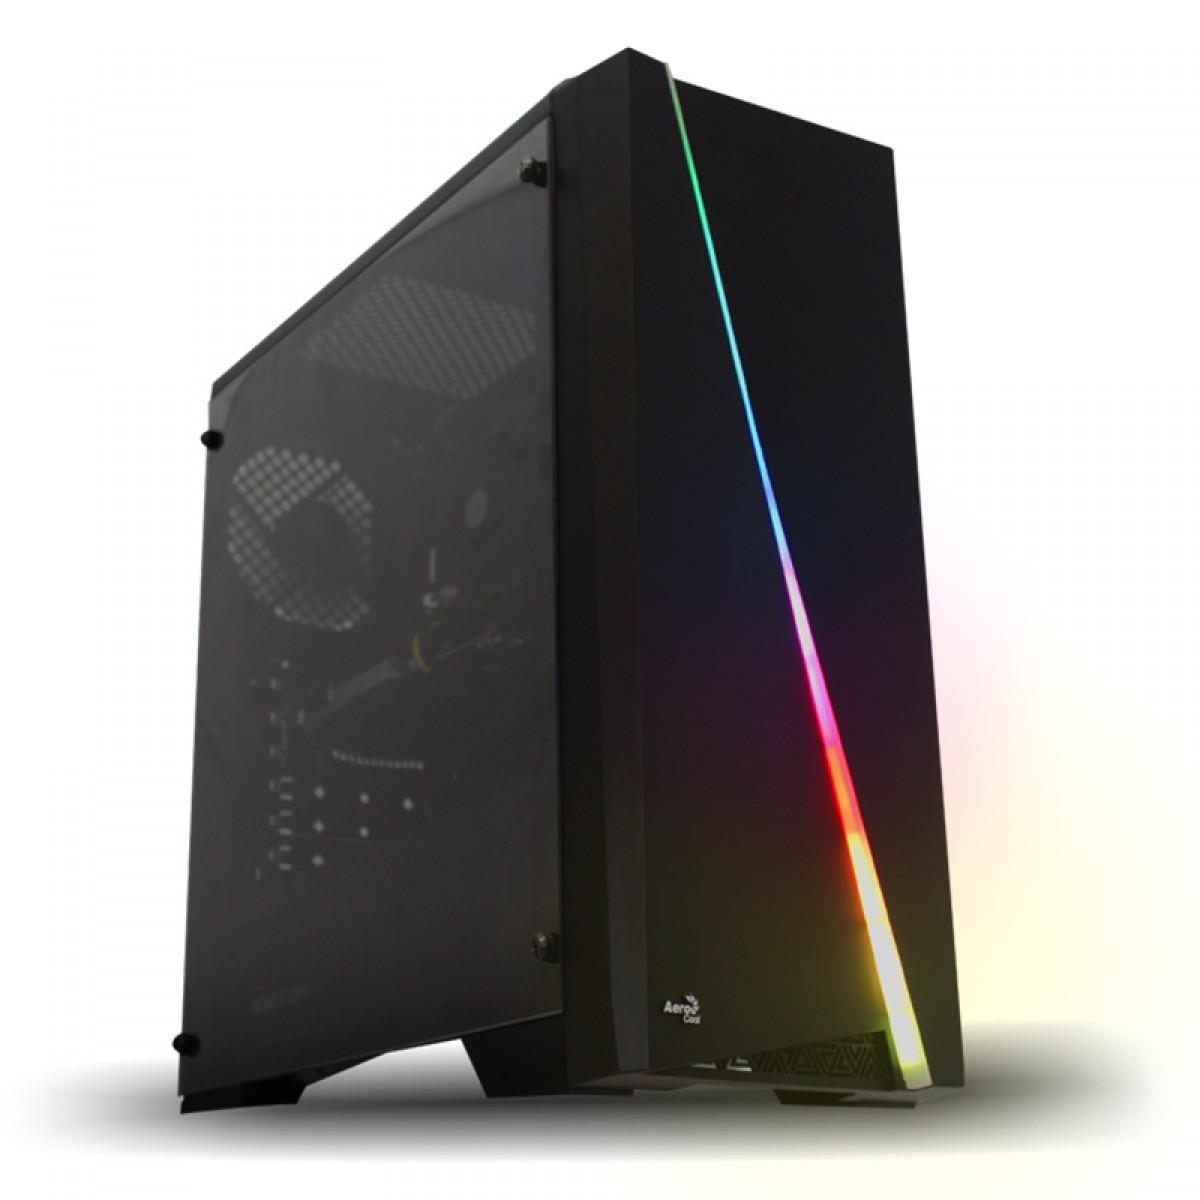 Pc Gamer T-Power Warlord LVL-3 AMD Ryzen 7 2700X / Geforce RTX 2080 8GB / DDR4 16GB / HD 1TB / 700W